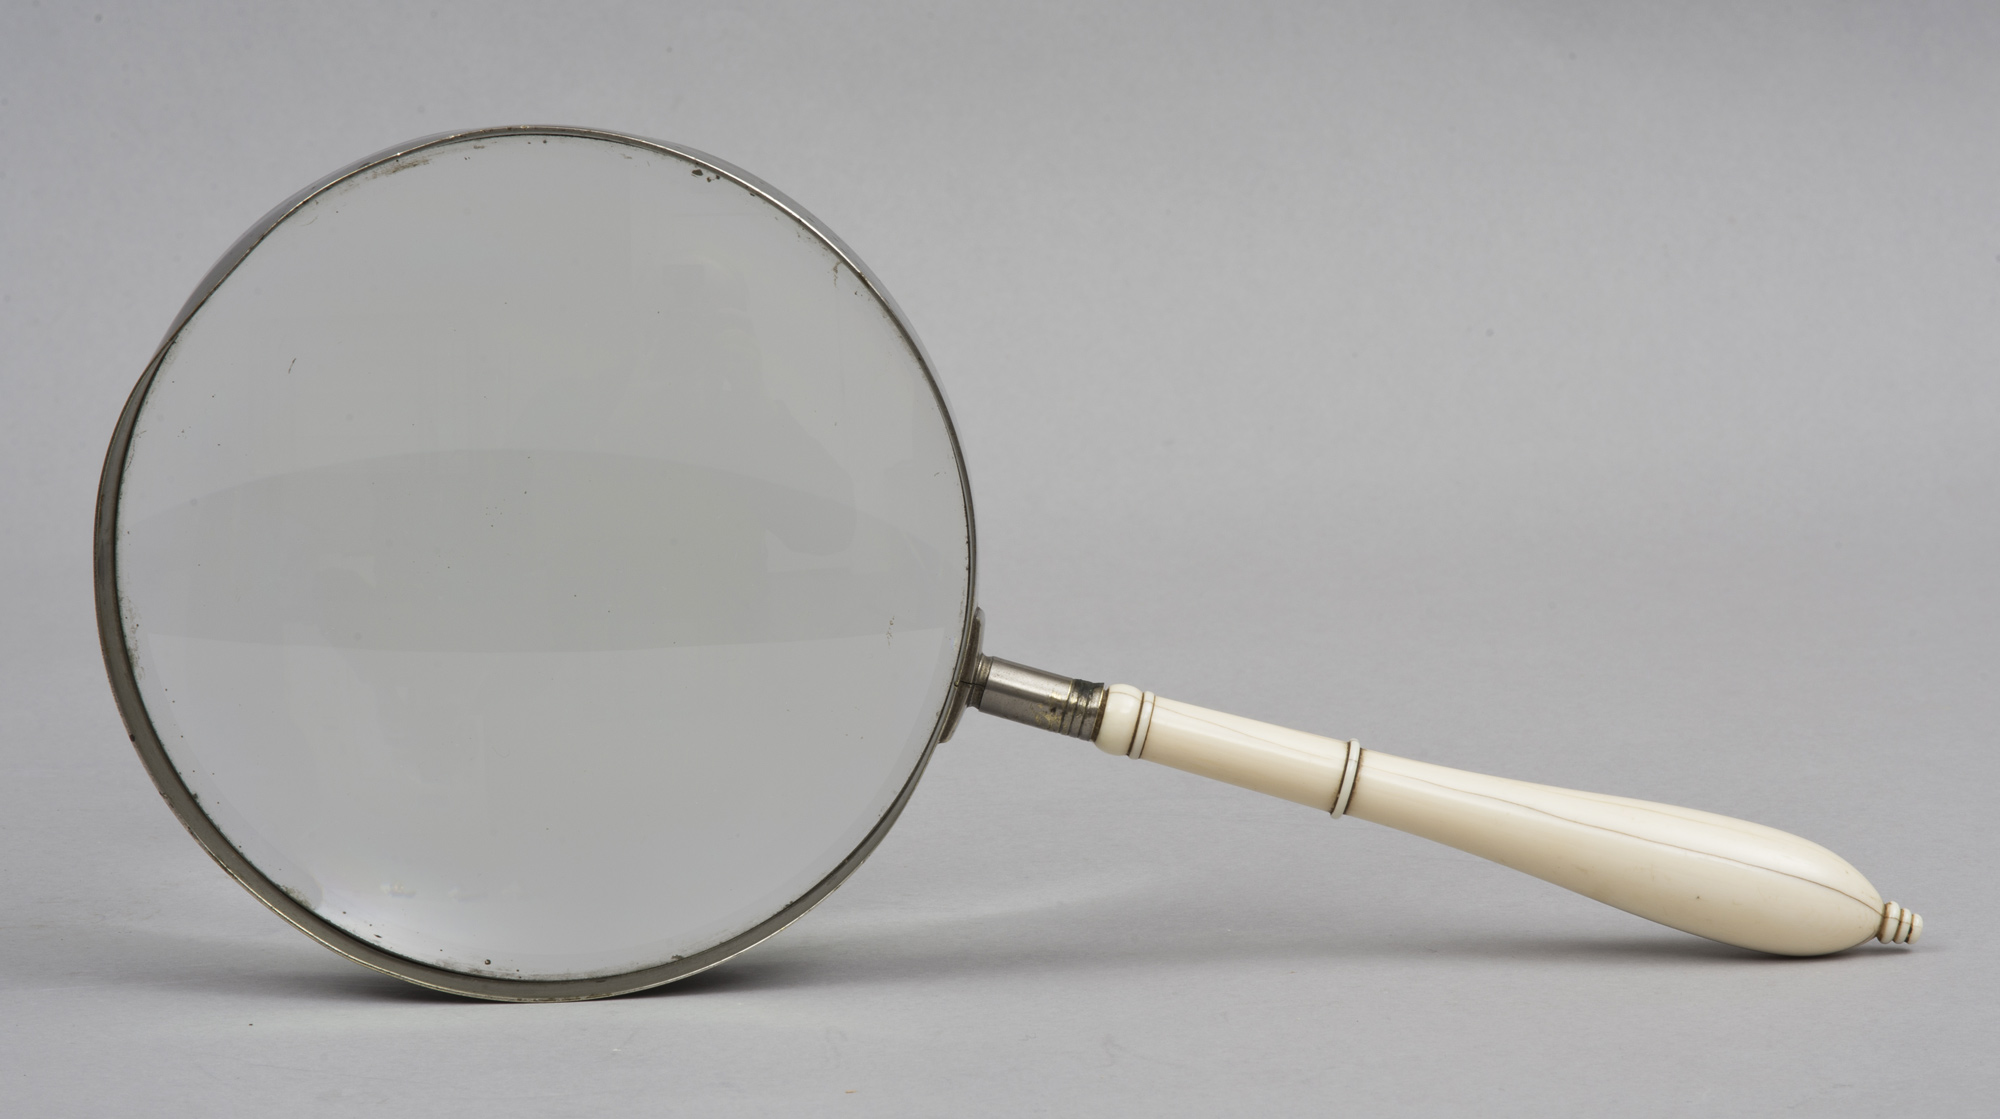 Arthur Evans' Magnifying Glass